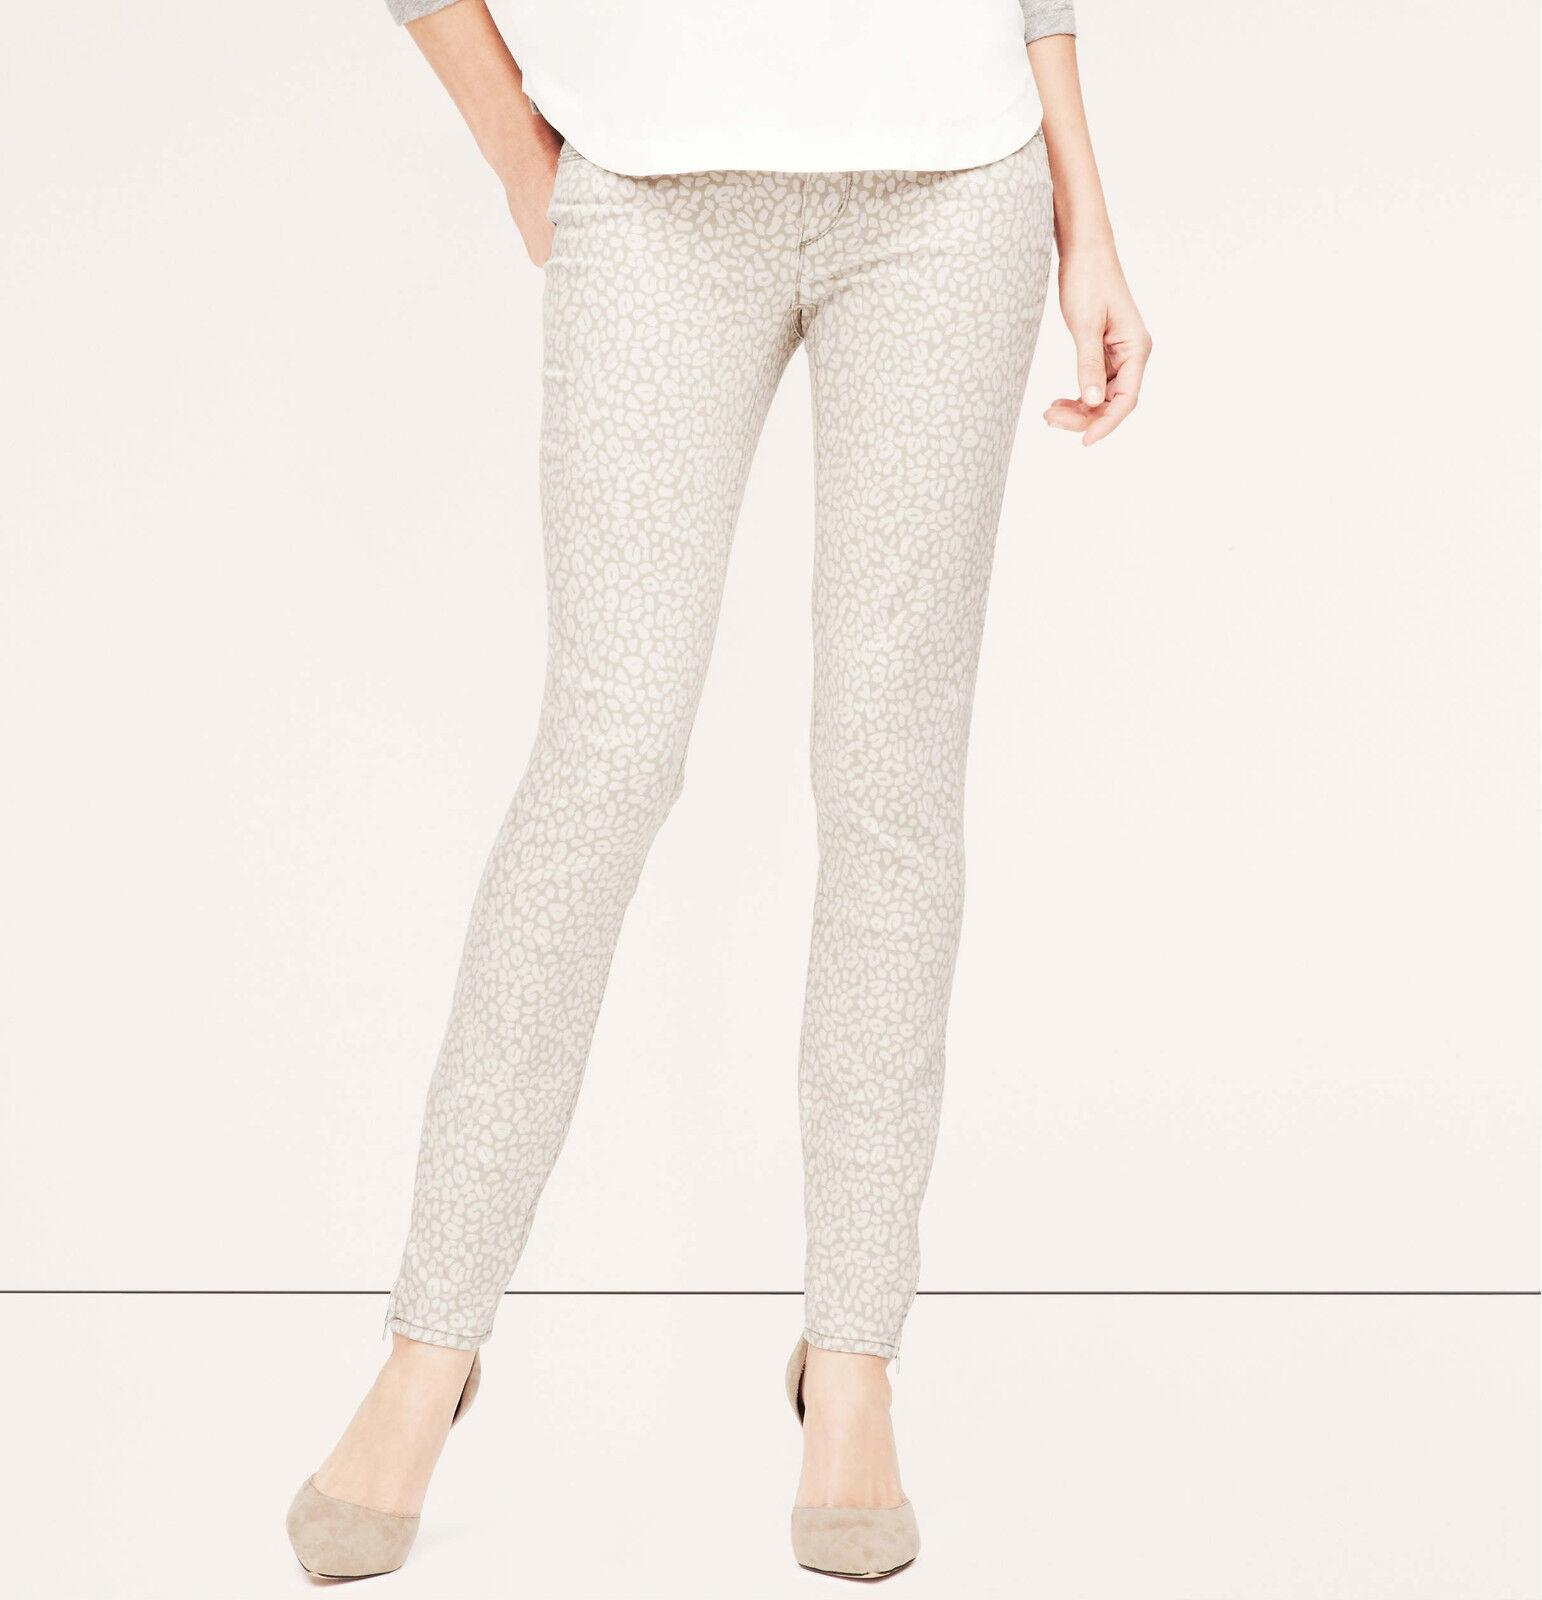 Ann Taylor LOFT Modern Skinny Ankle Zip Jeans Pants in Animal Print 25, 27, 30